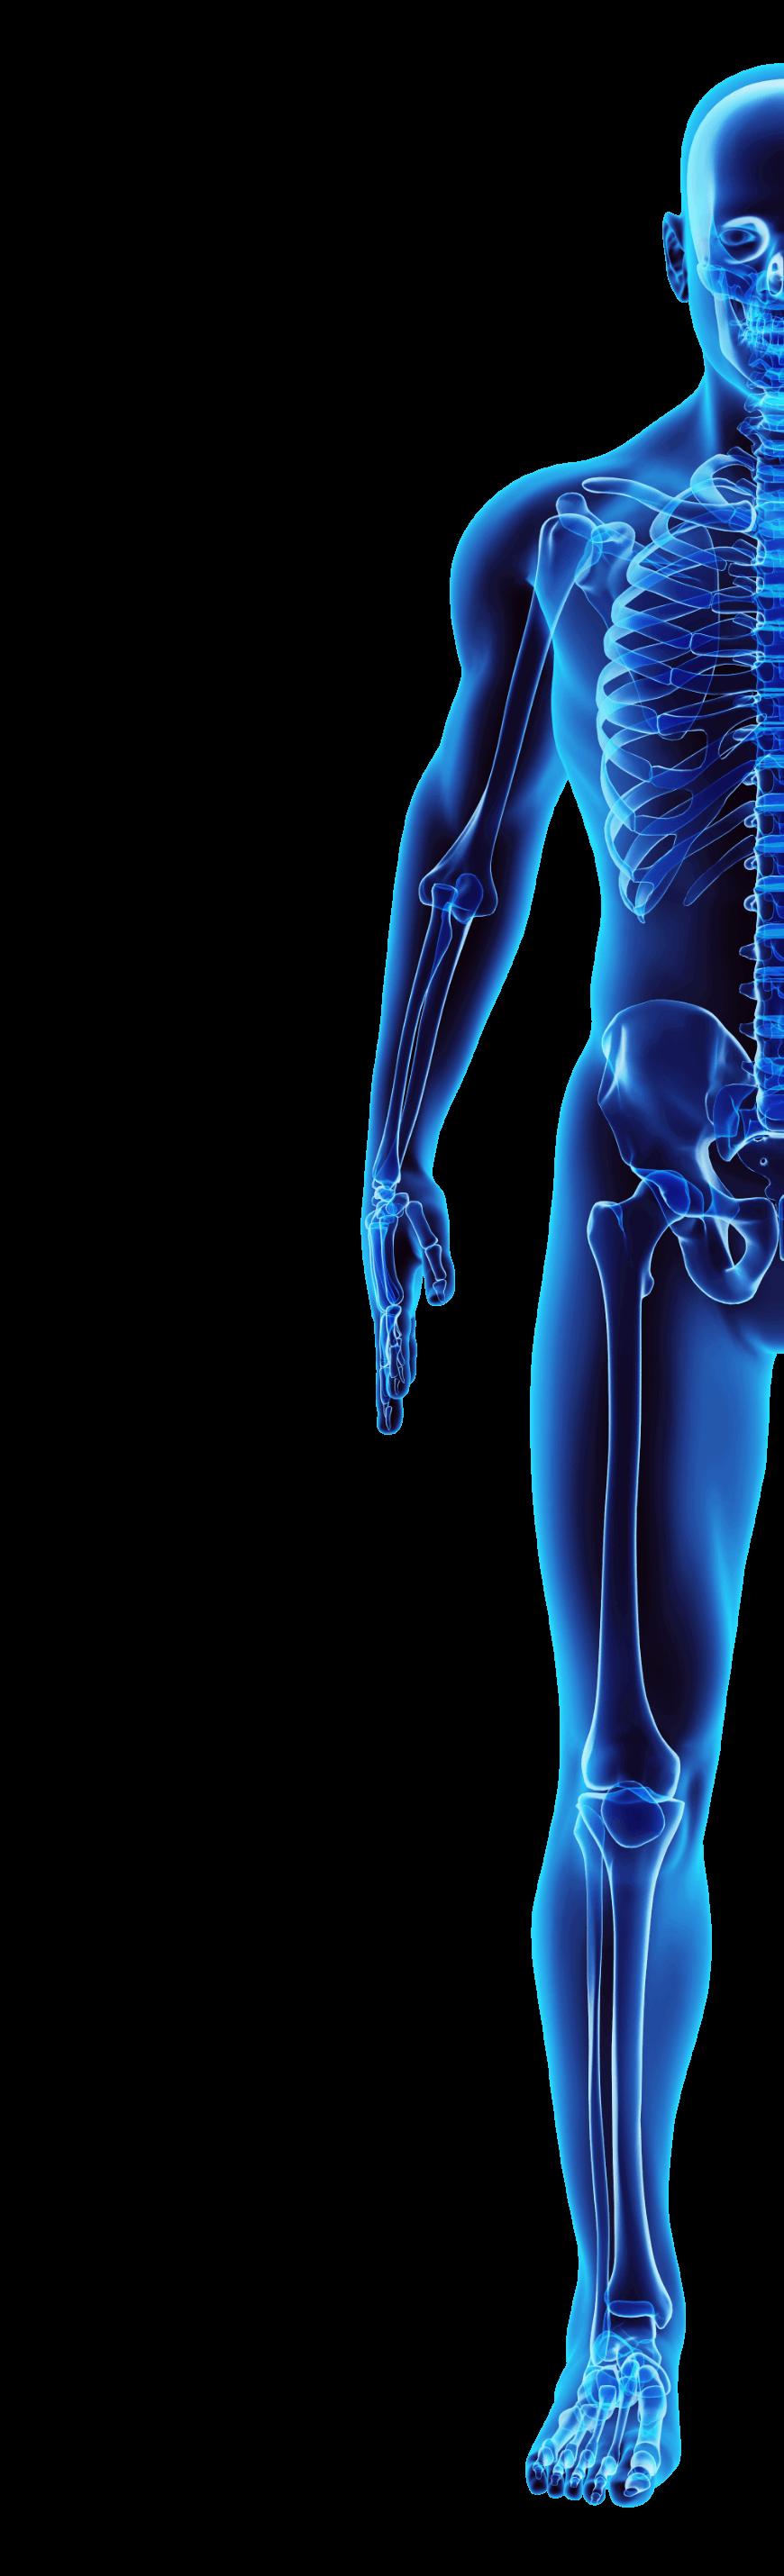 Illustration of human body.